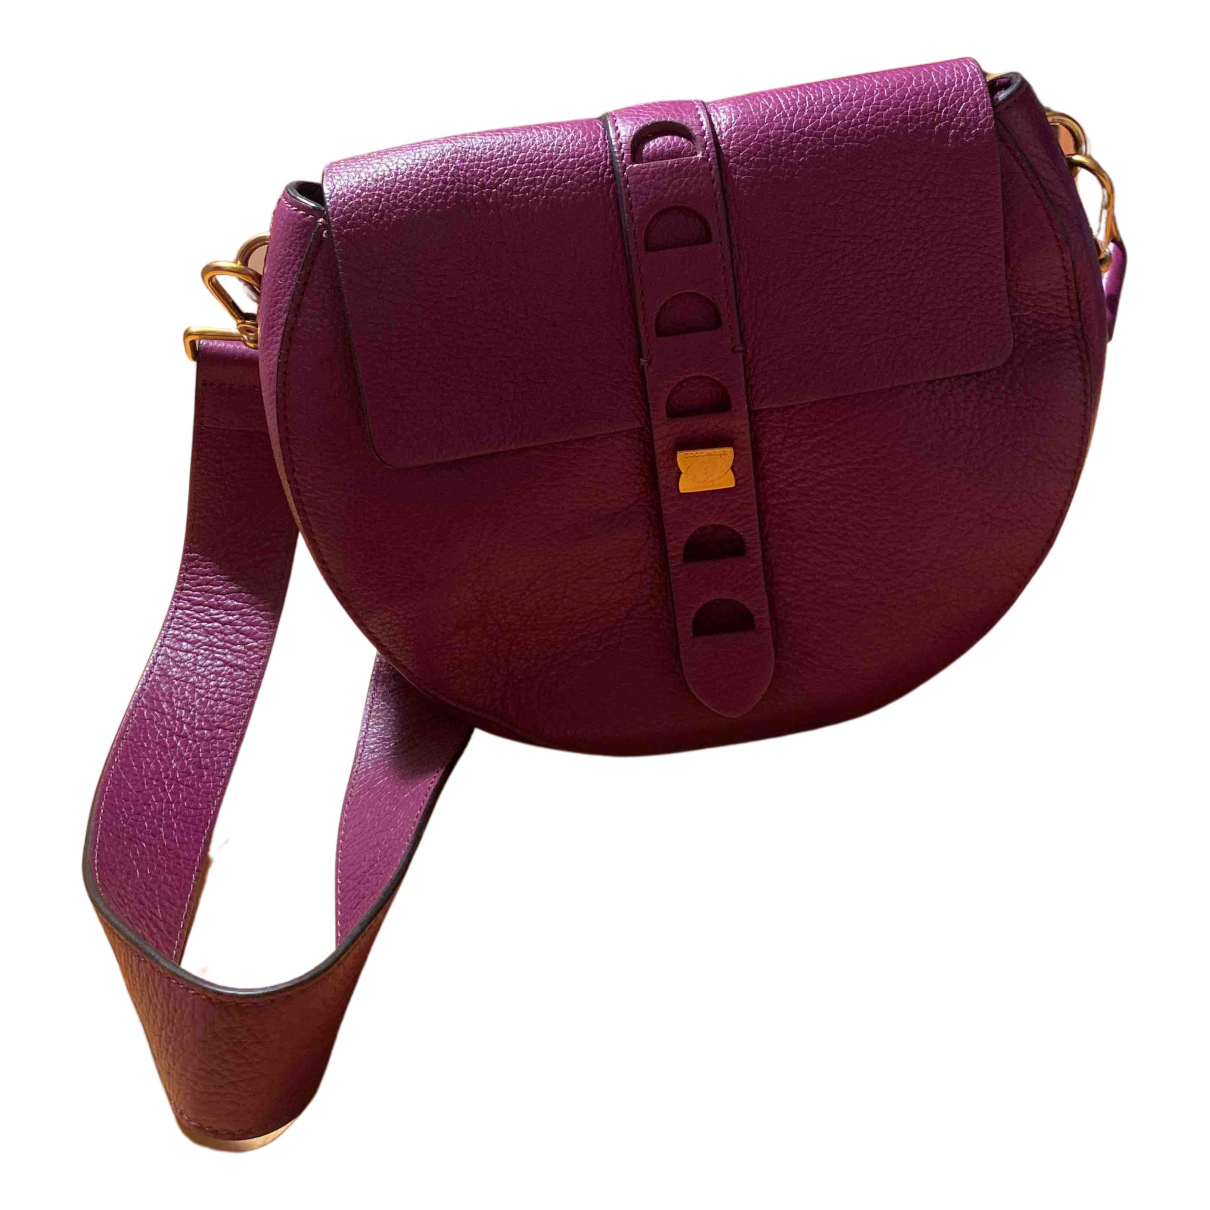 Coccinelle \N Purple Leather handbag for Women \N